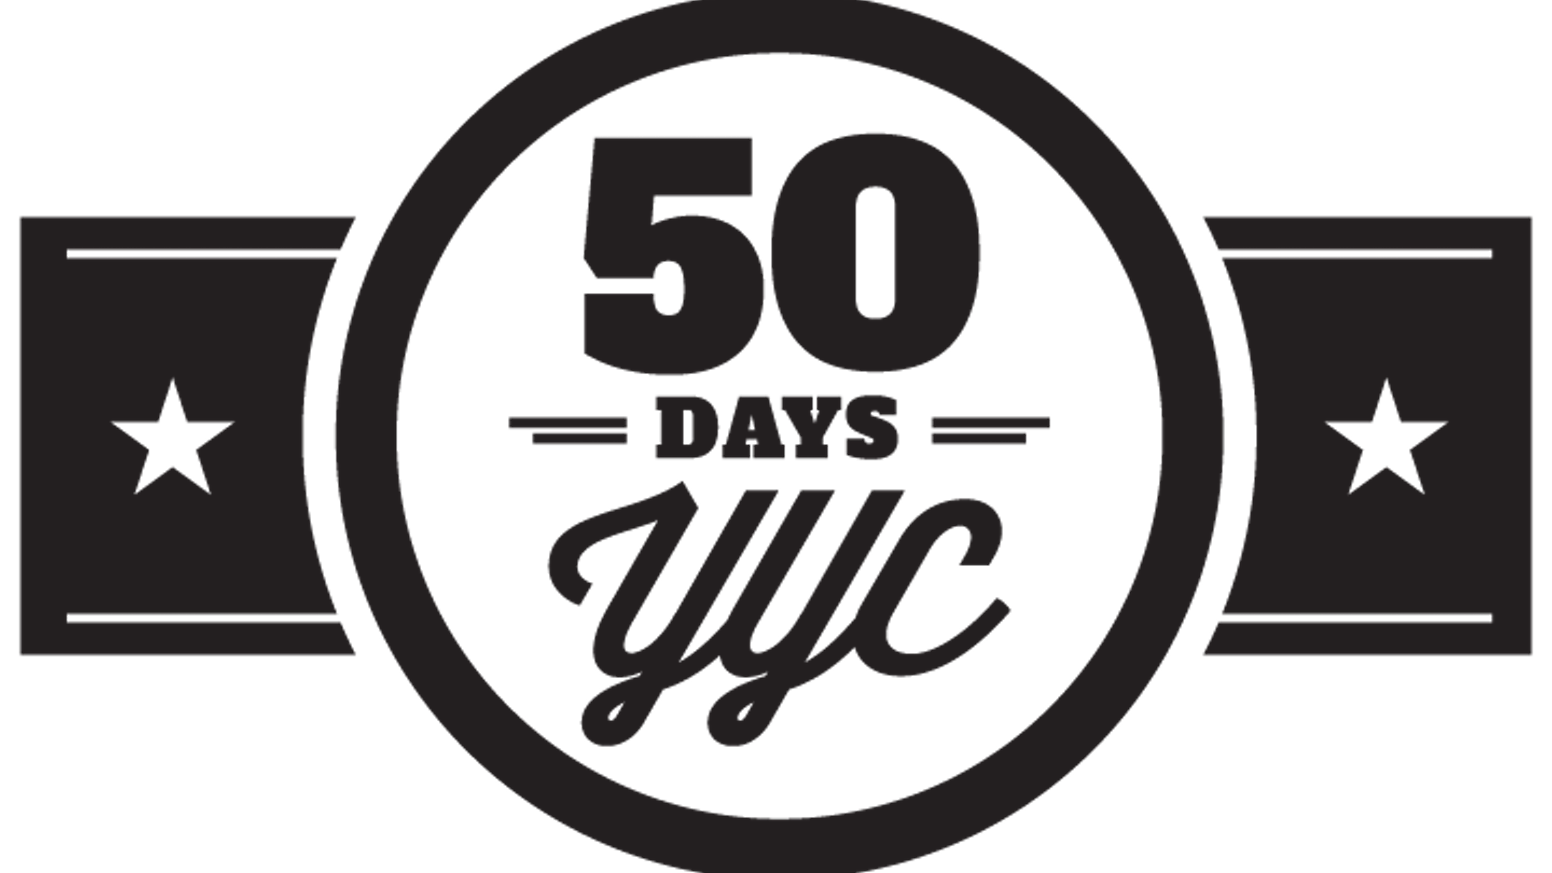 50 Days YYC by 50 Days YYC - The Calgary Music Movement ...